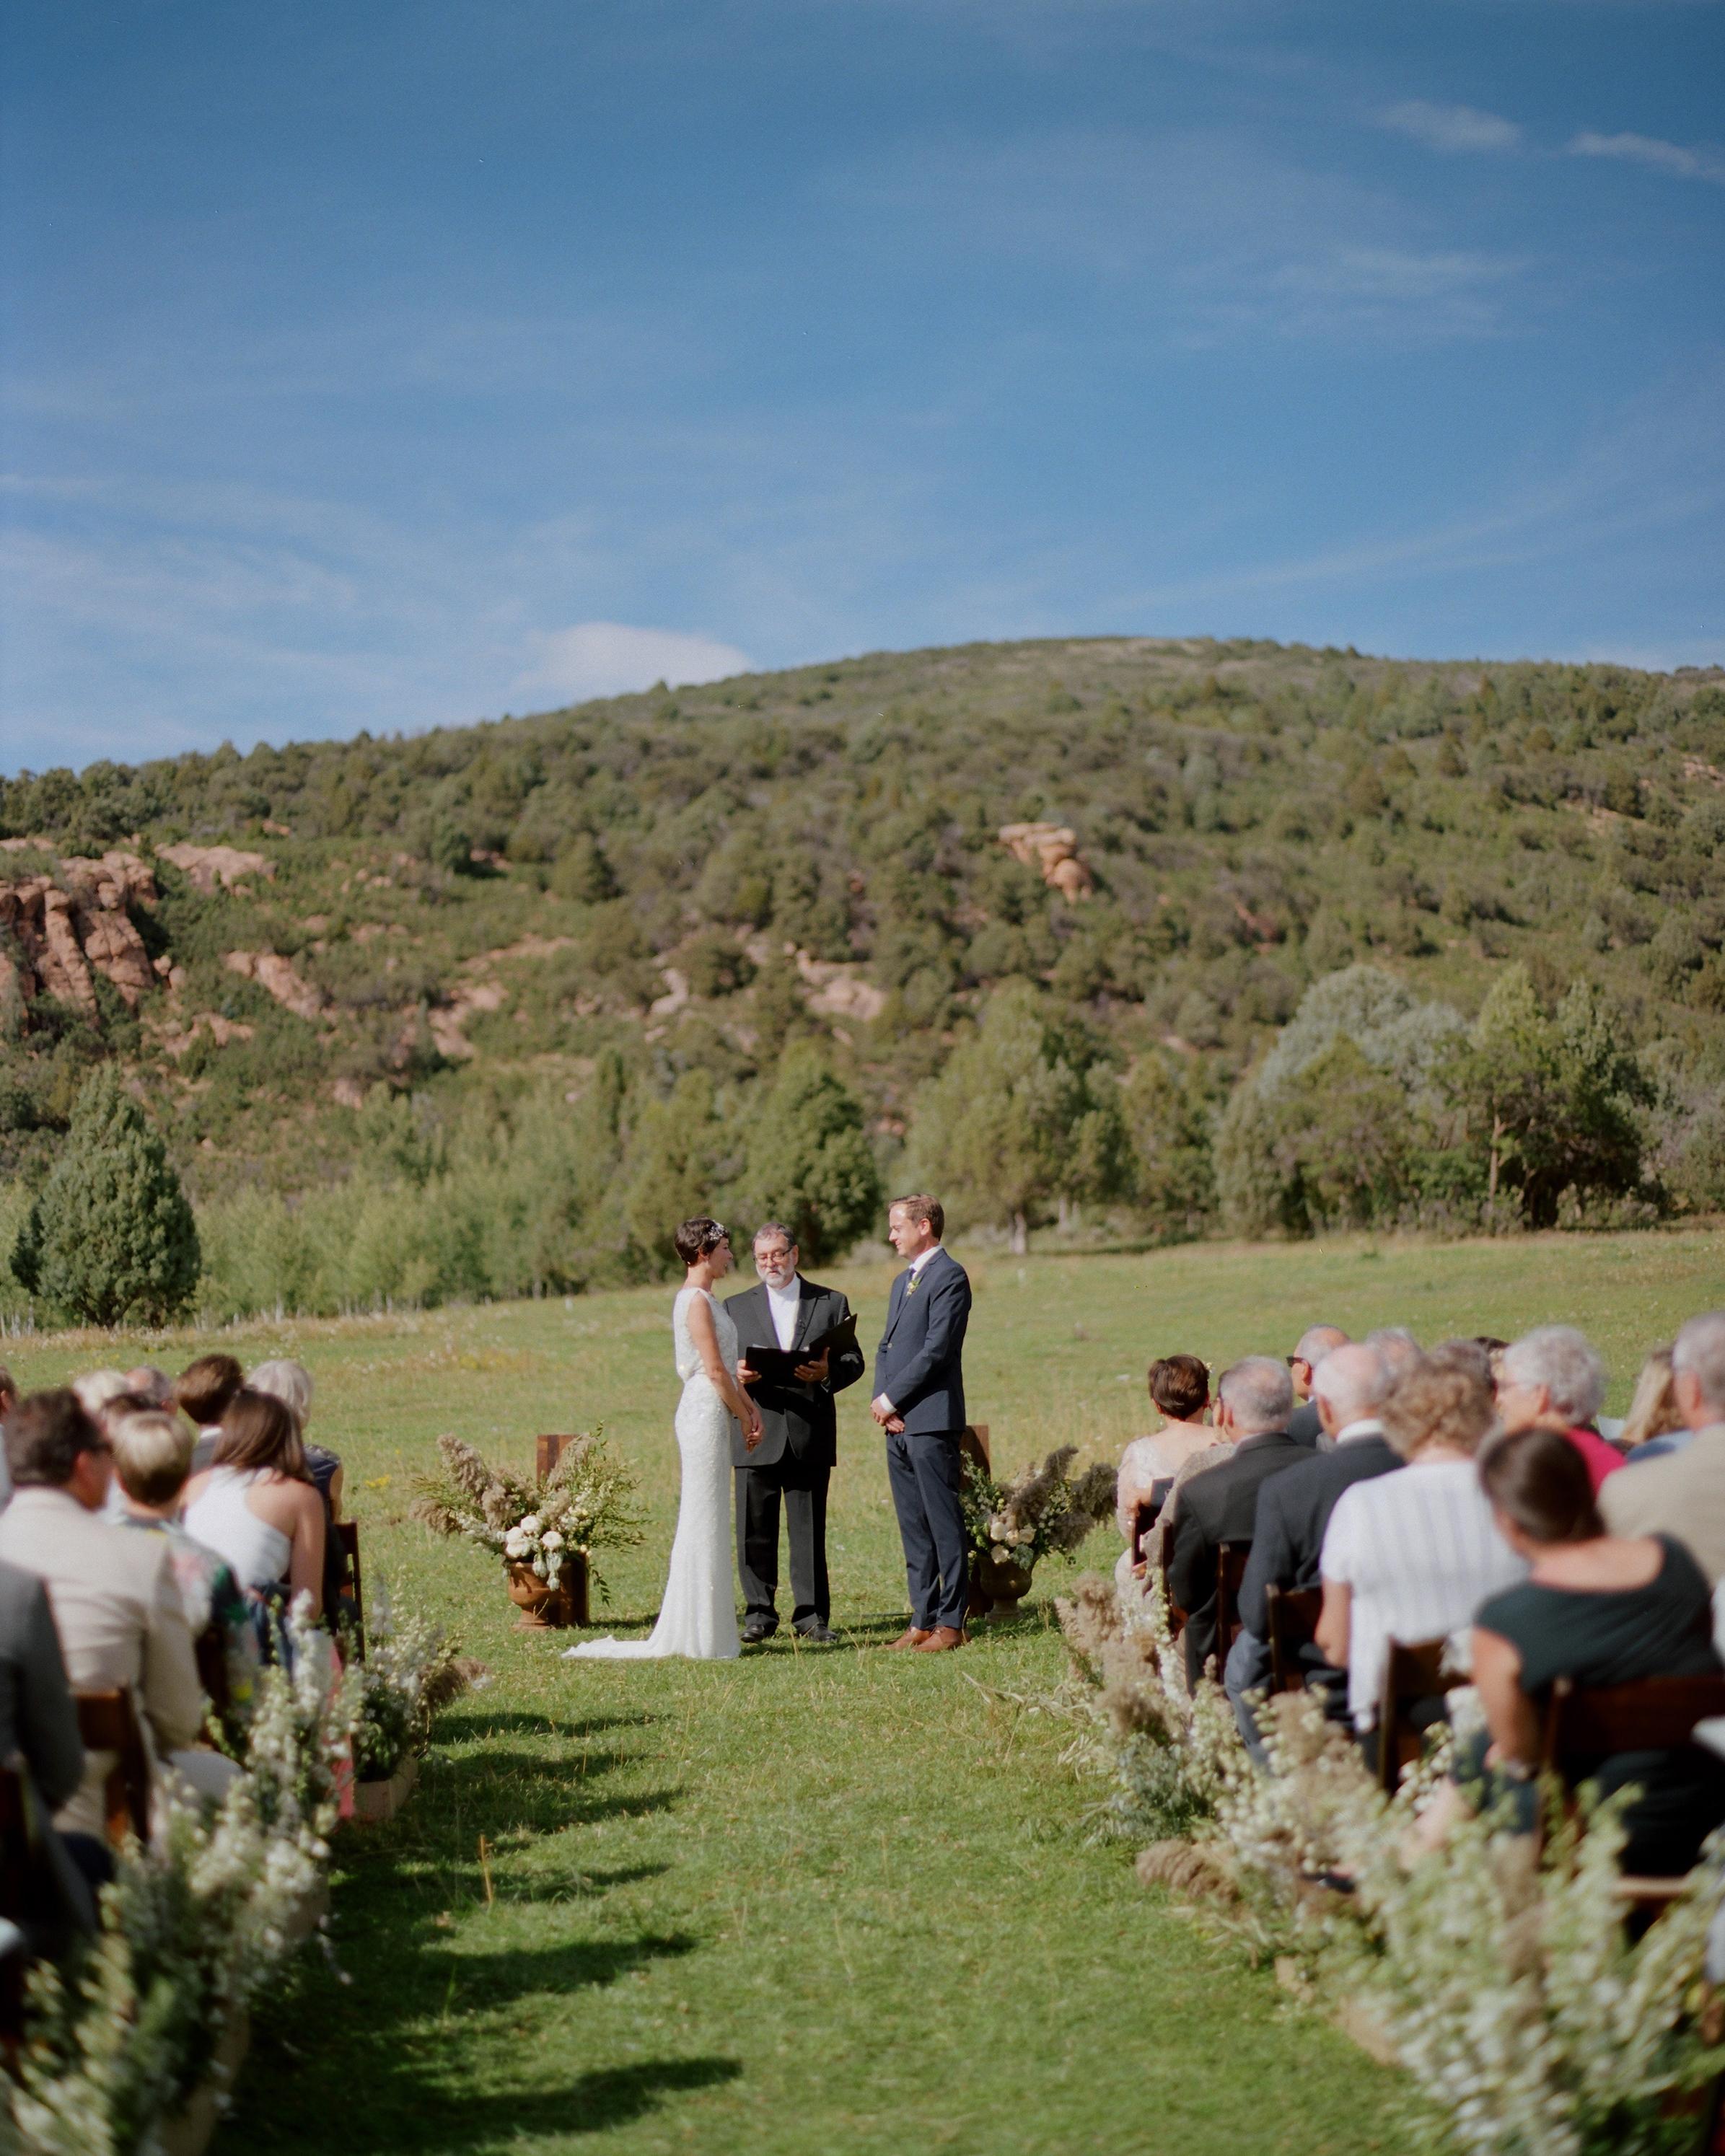 lizzy-pat-wedding-ceremony-115-s111777-0115.jpg